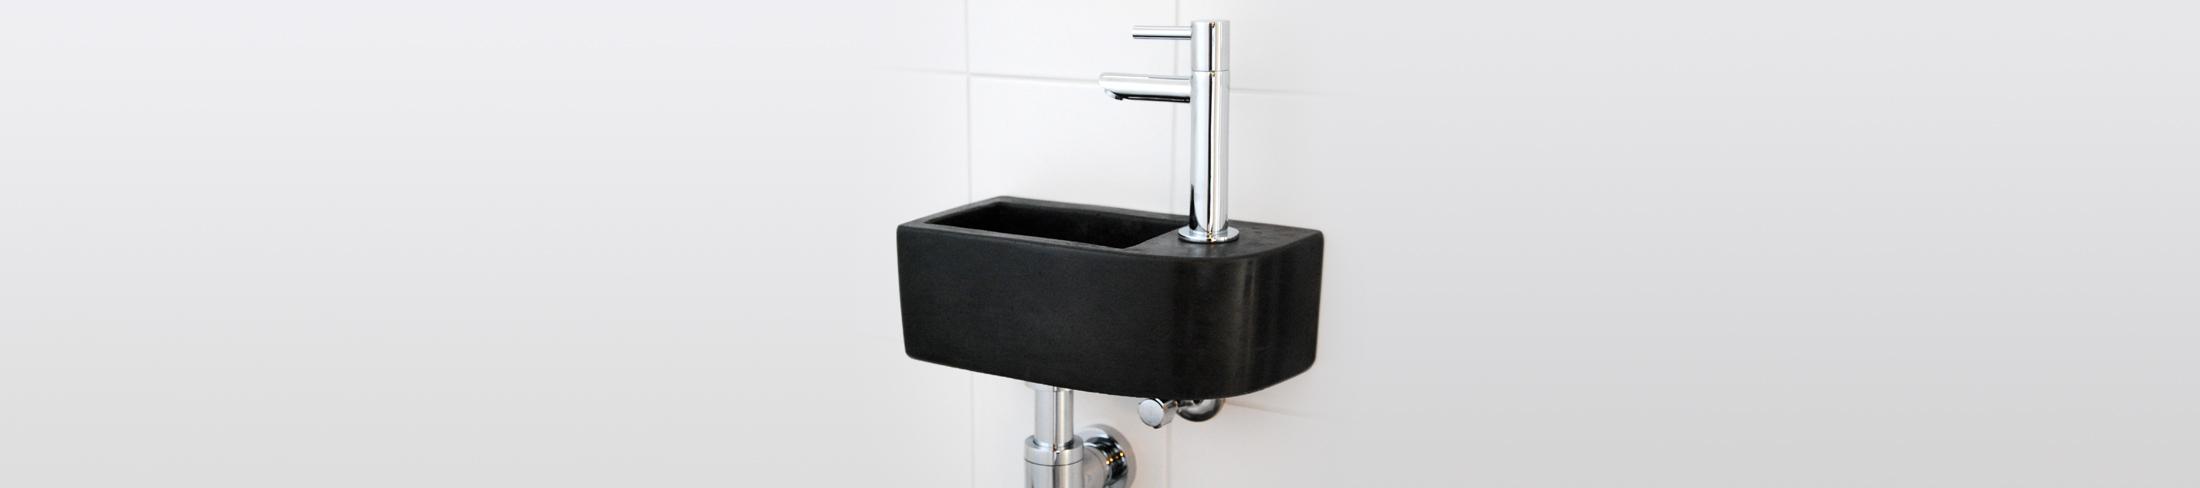 Toiletfontein van beton_Slider homepage_Klein toiletfontein zwart